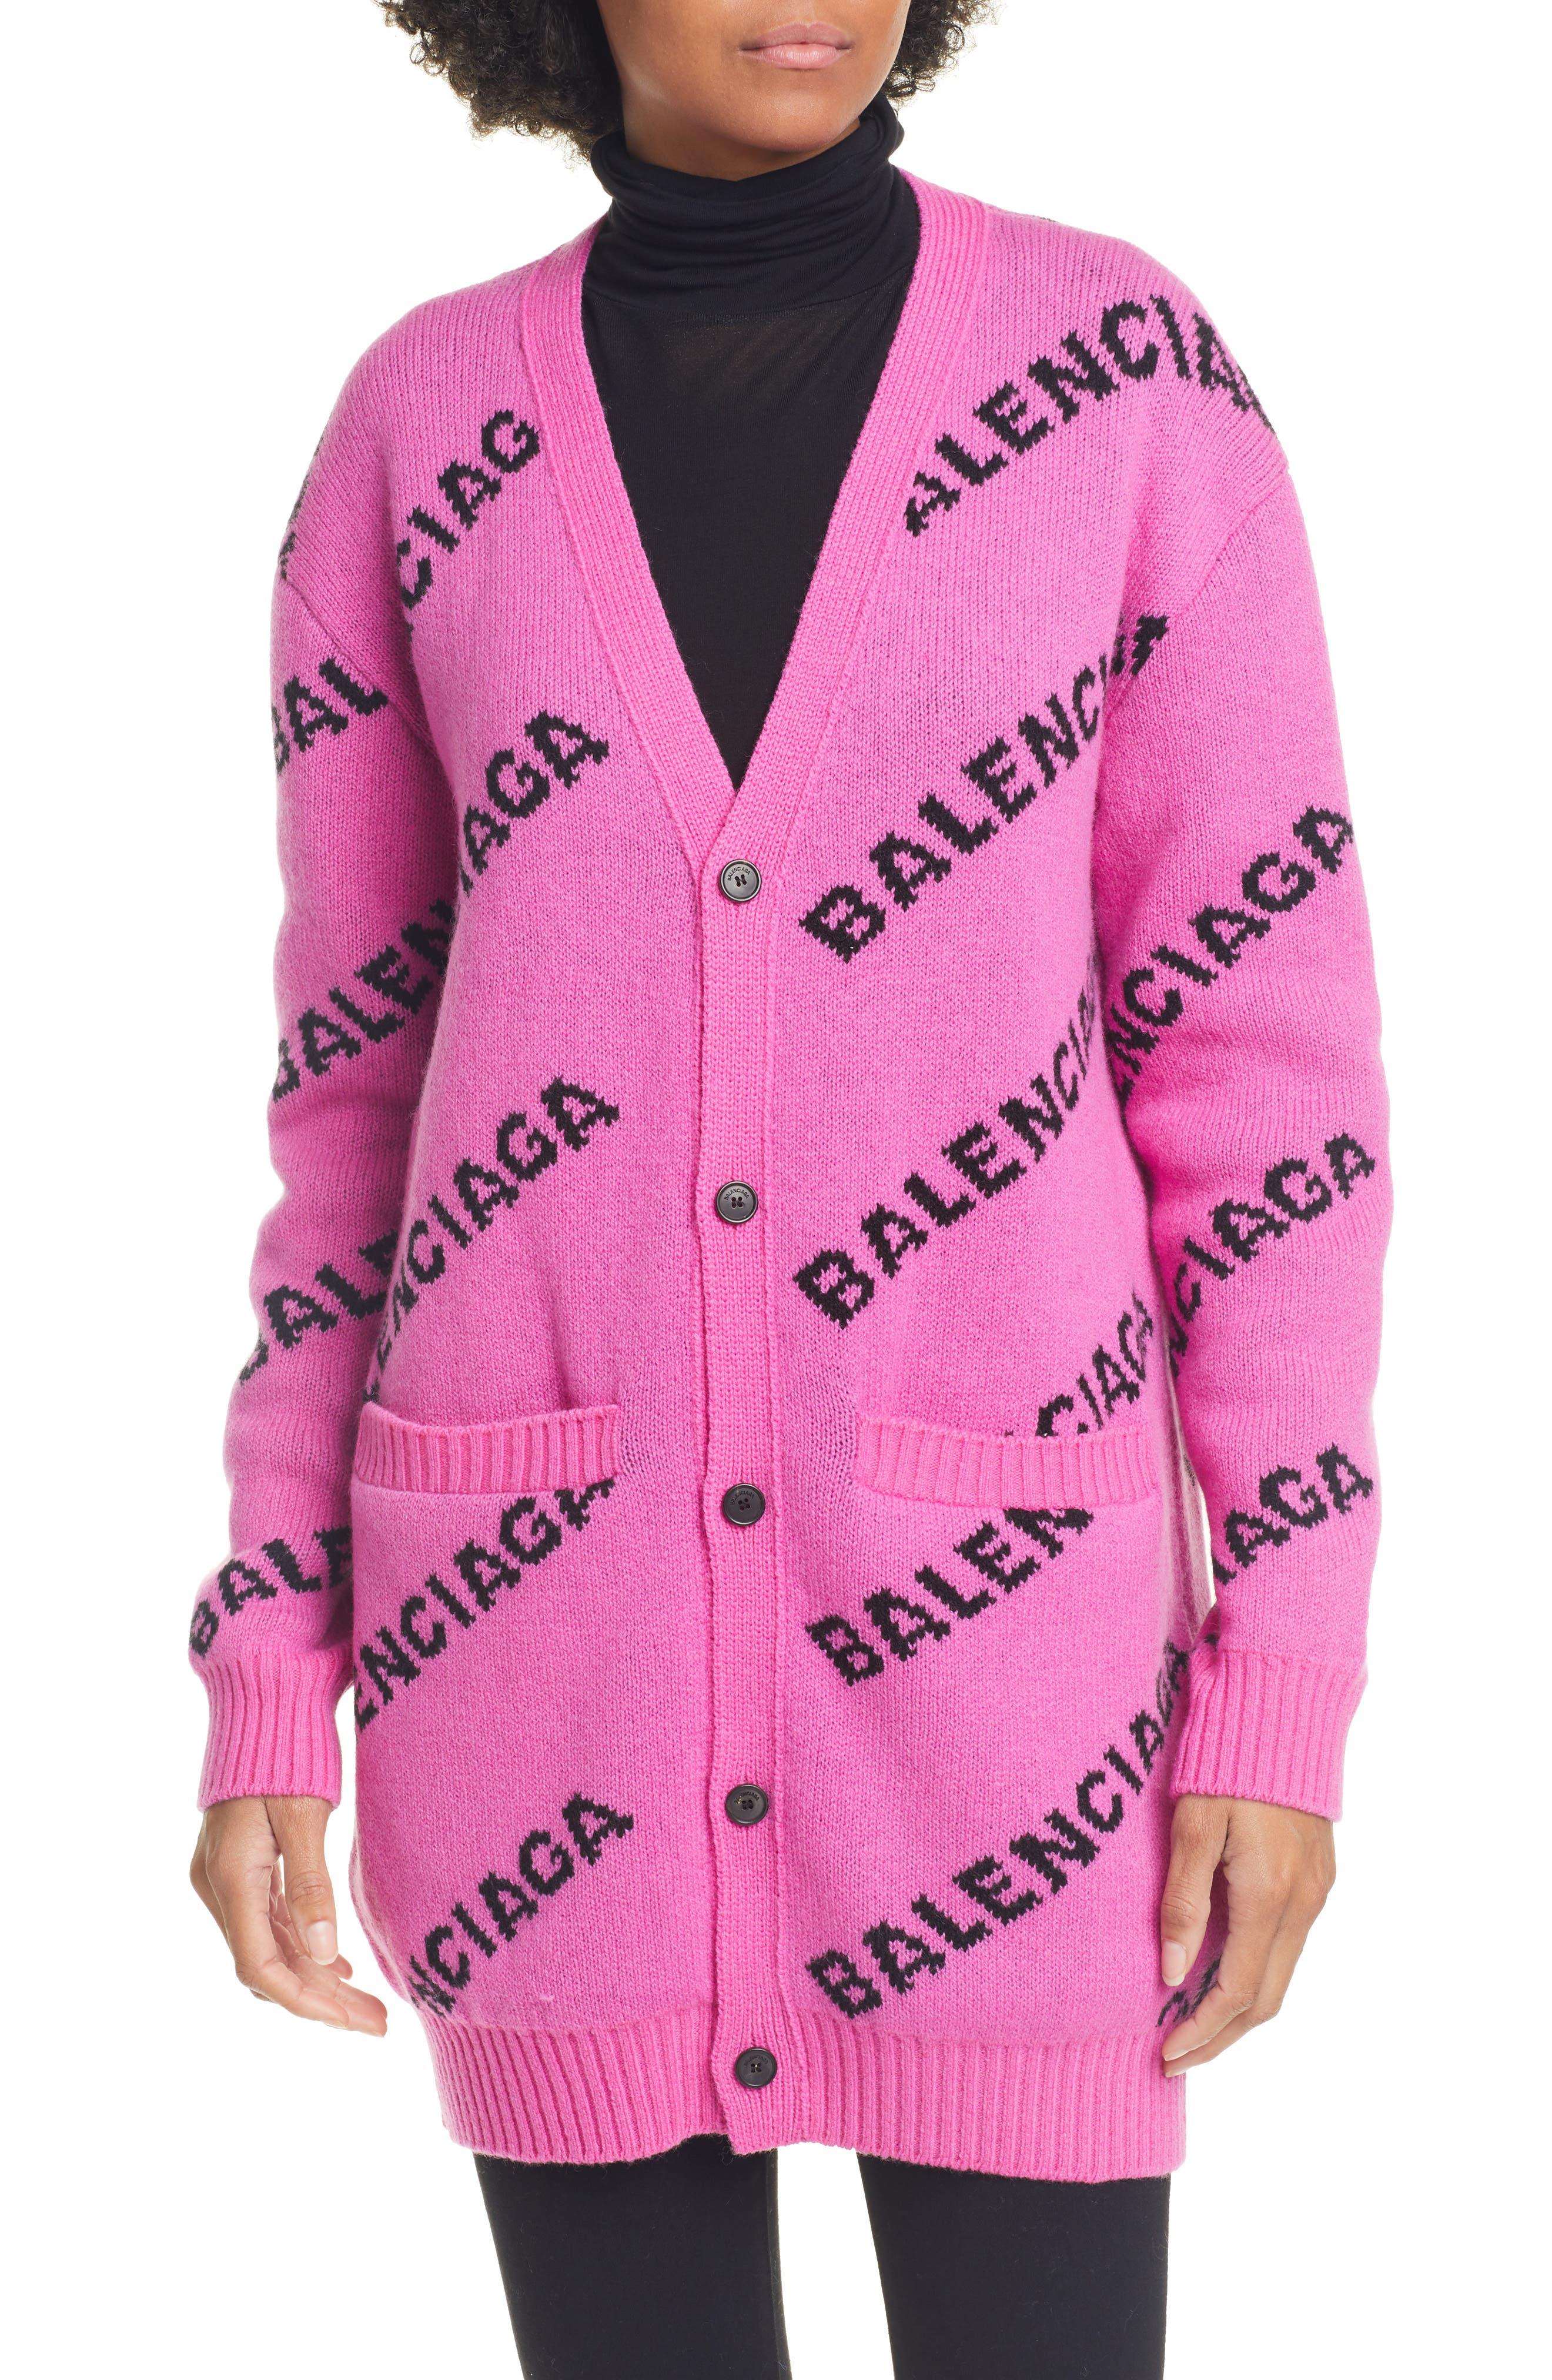 Balenciaga Tops Logo Jacquard Wool Blend Cardigan